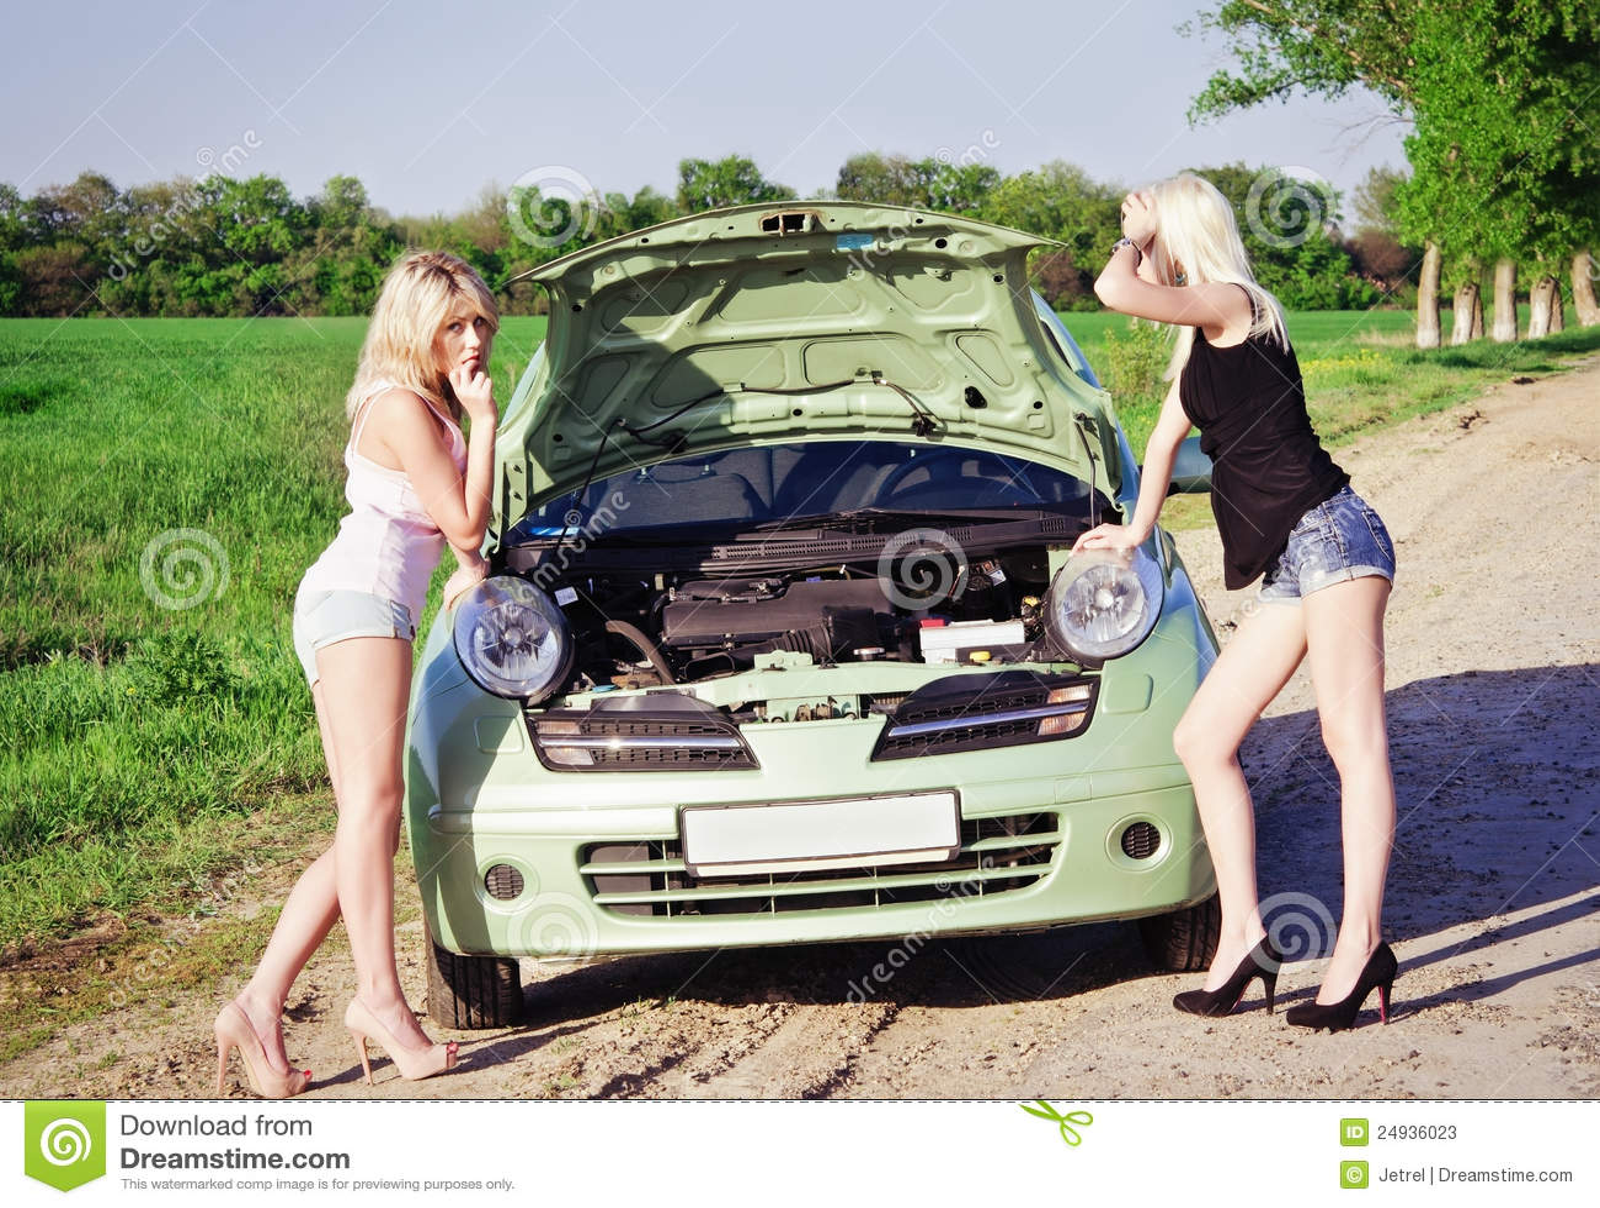 Трахнули за разбитую машину 11 фотография